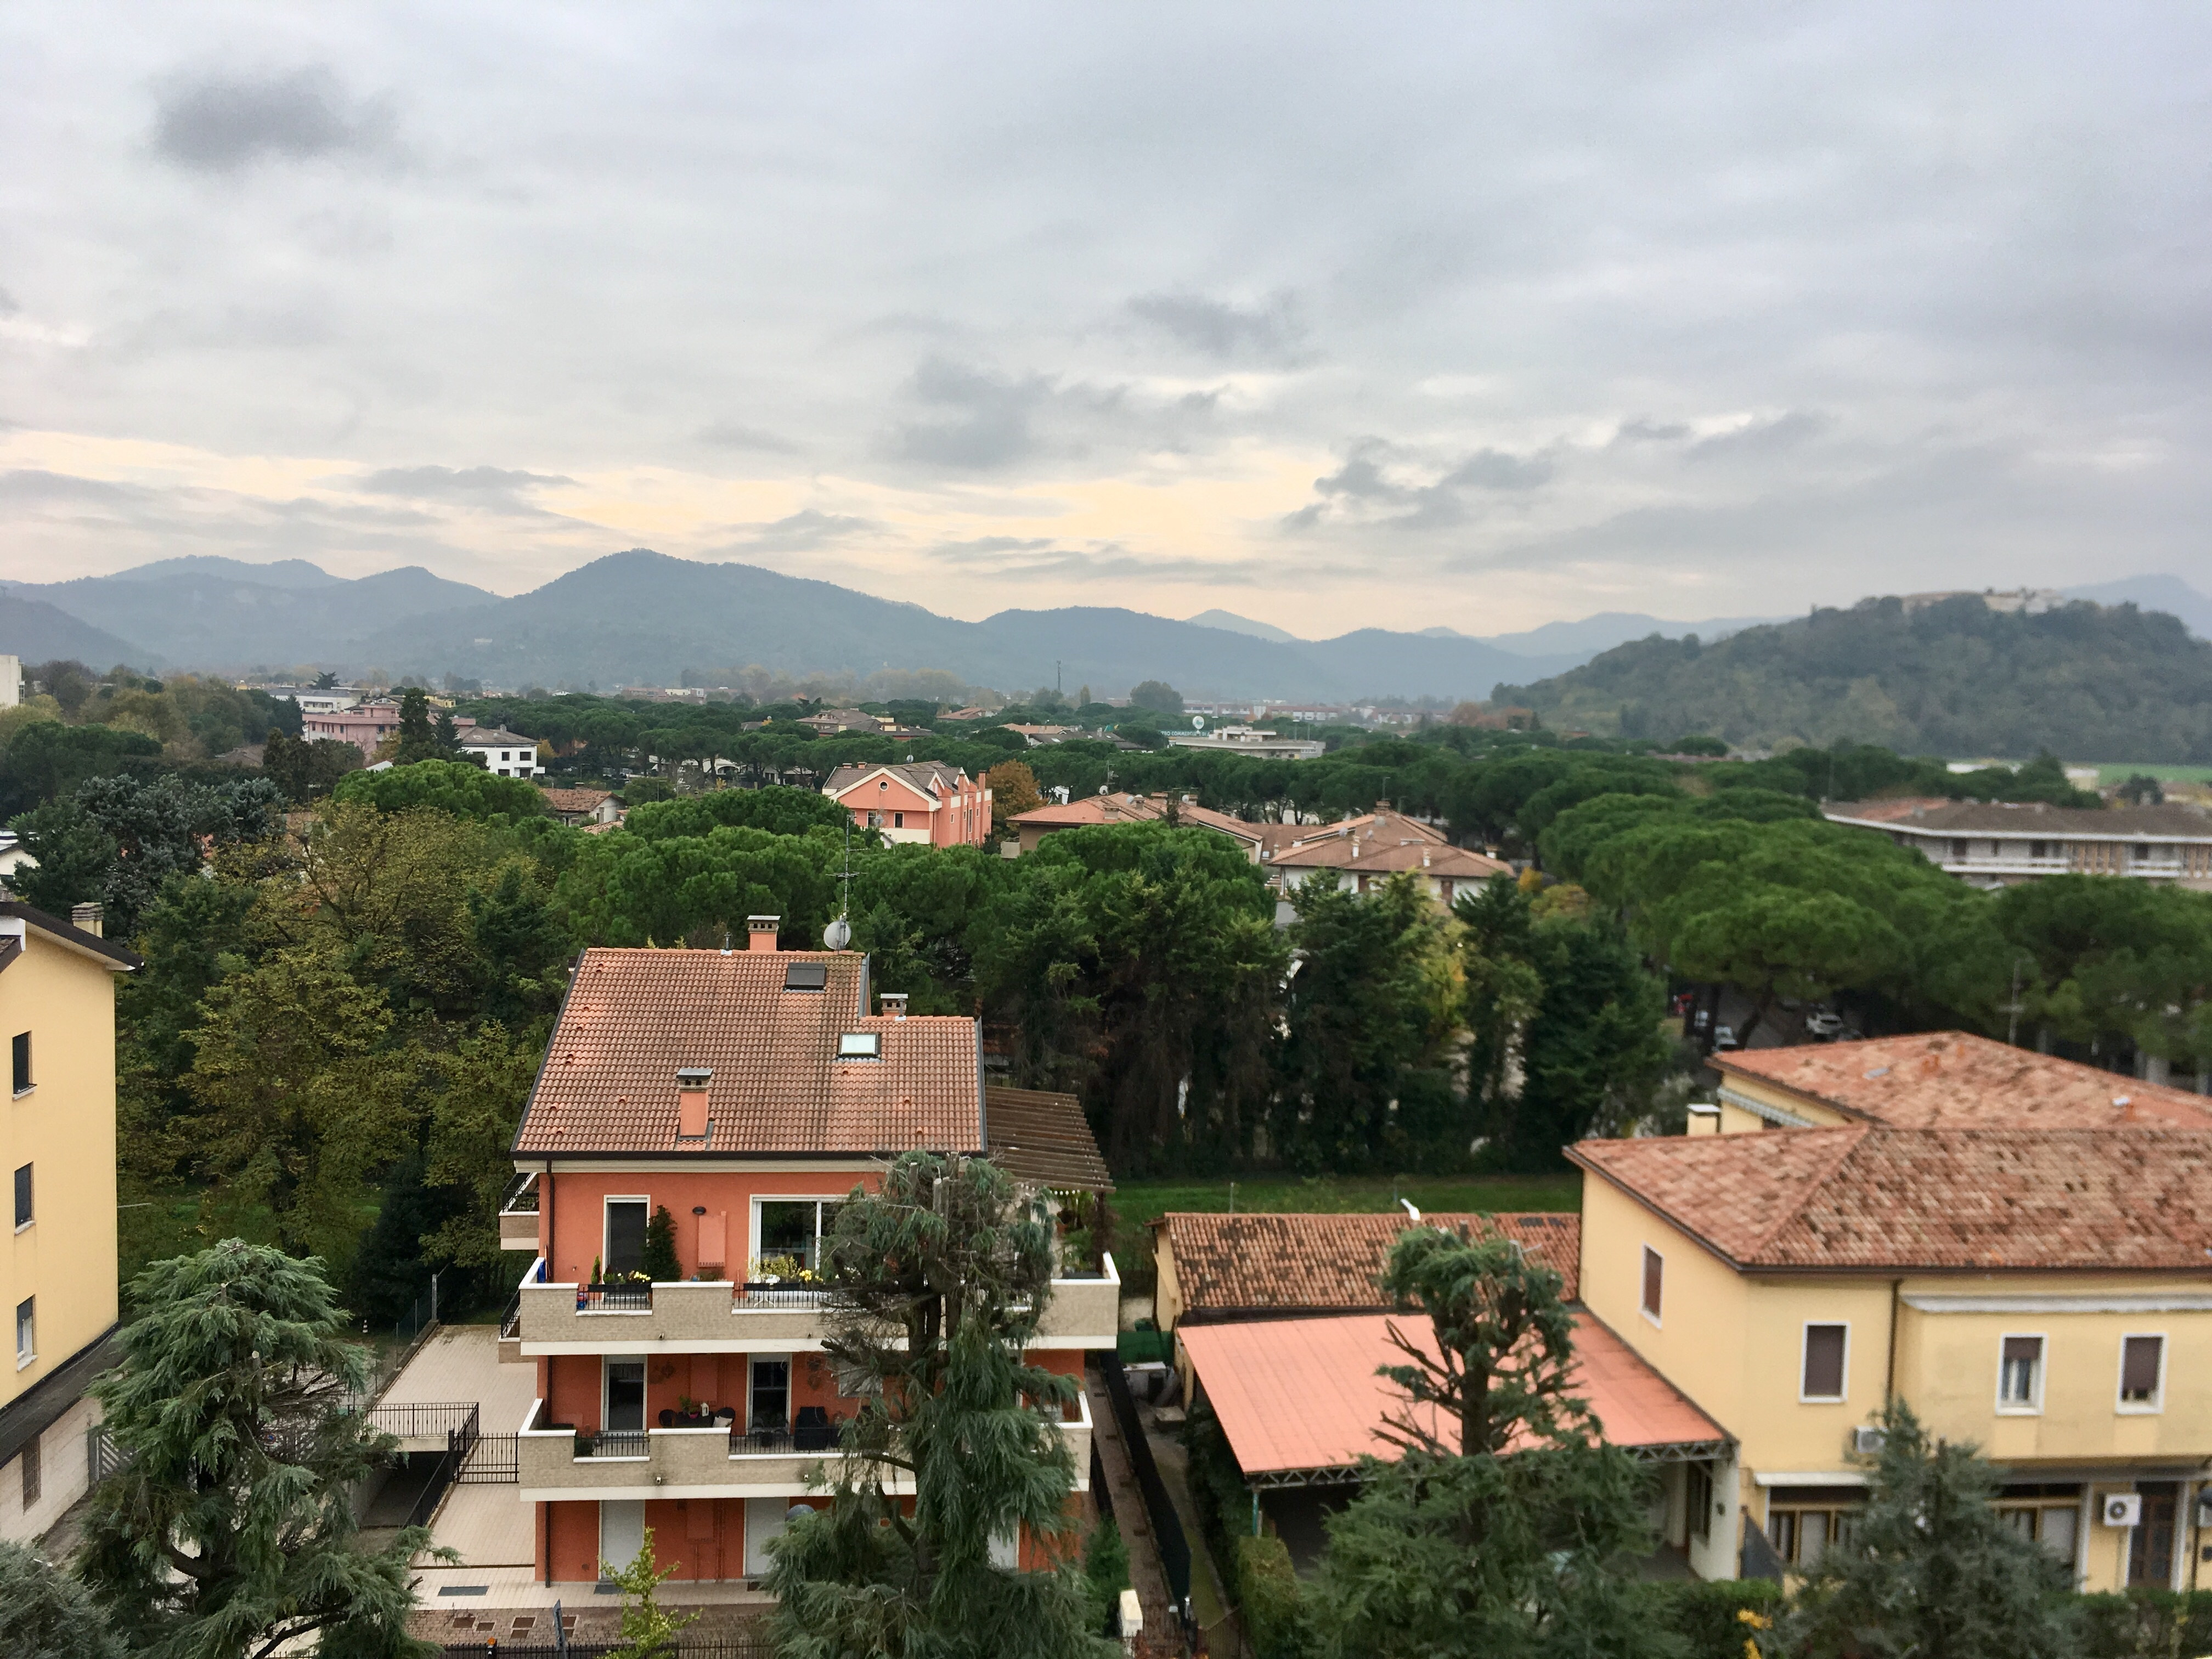 Термы Италии: Абано и Монтегротто